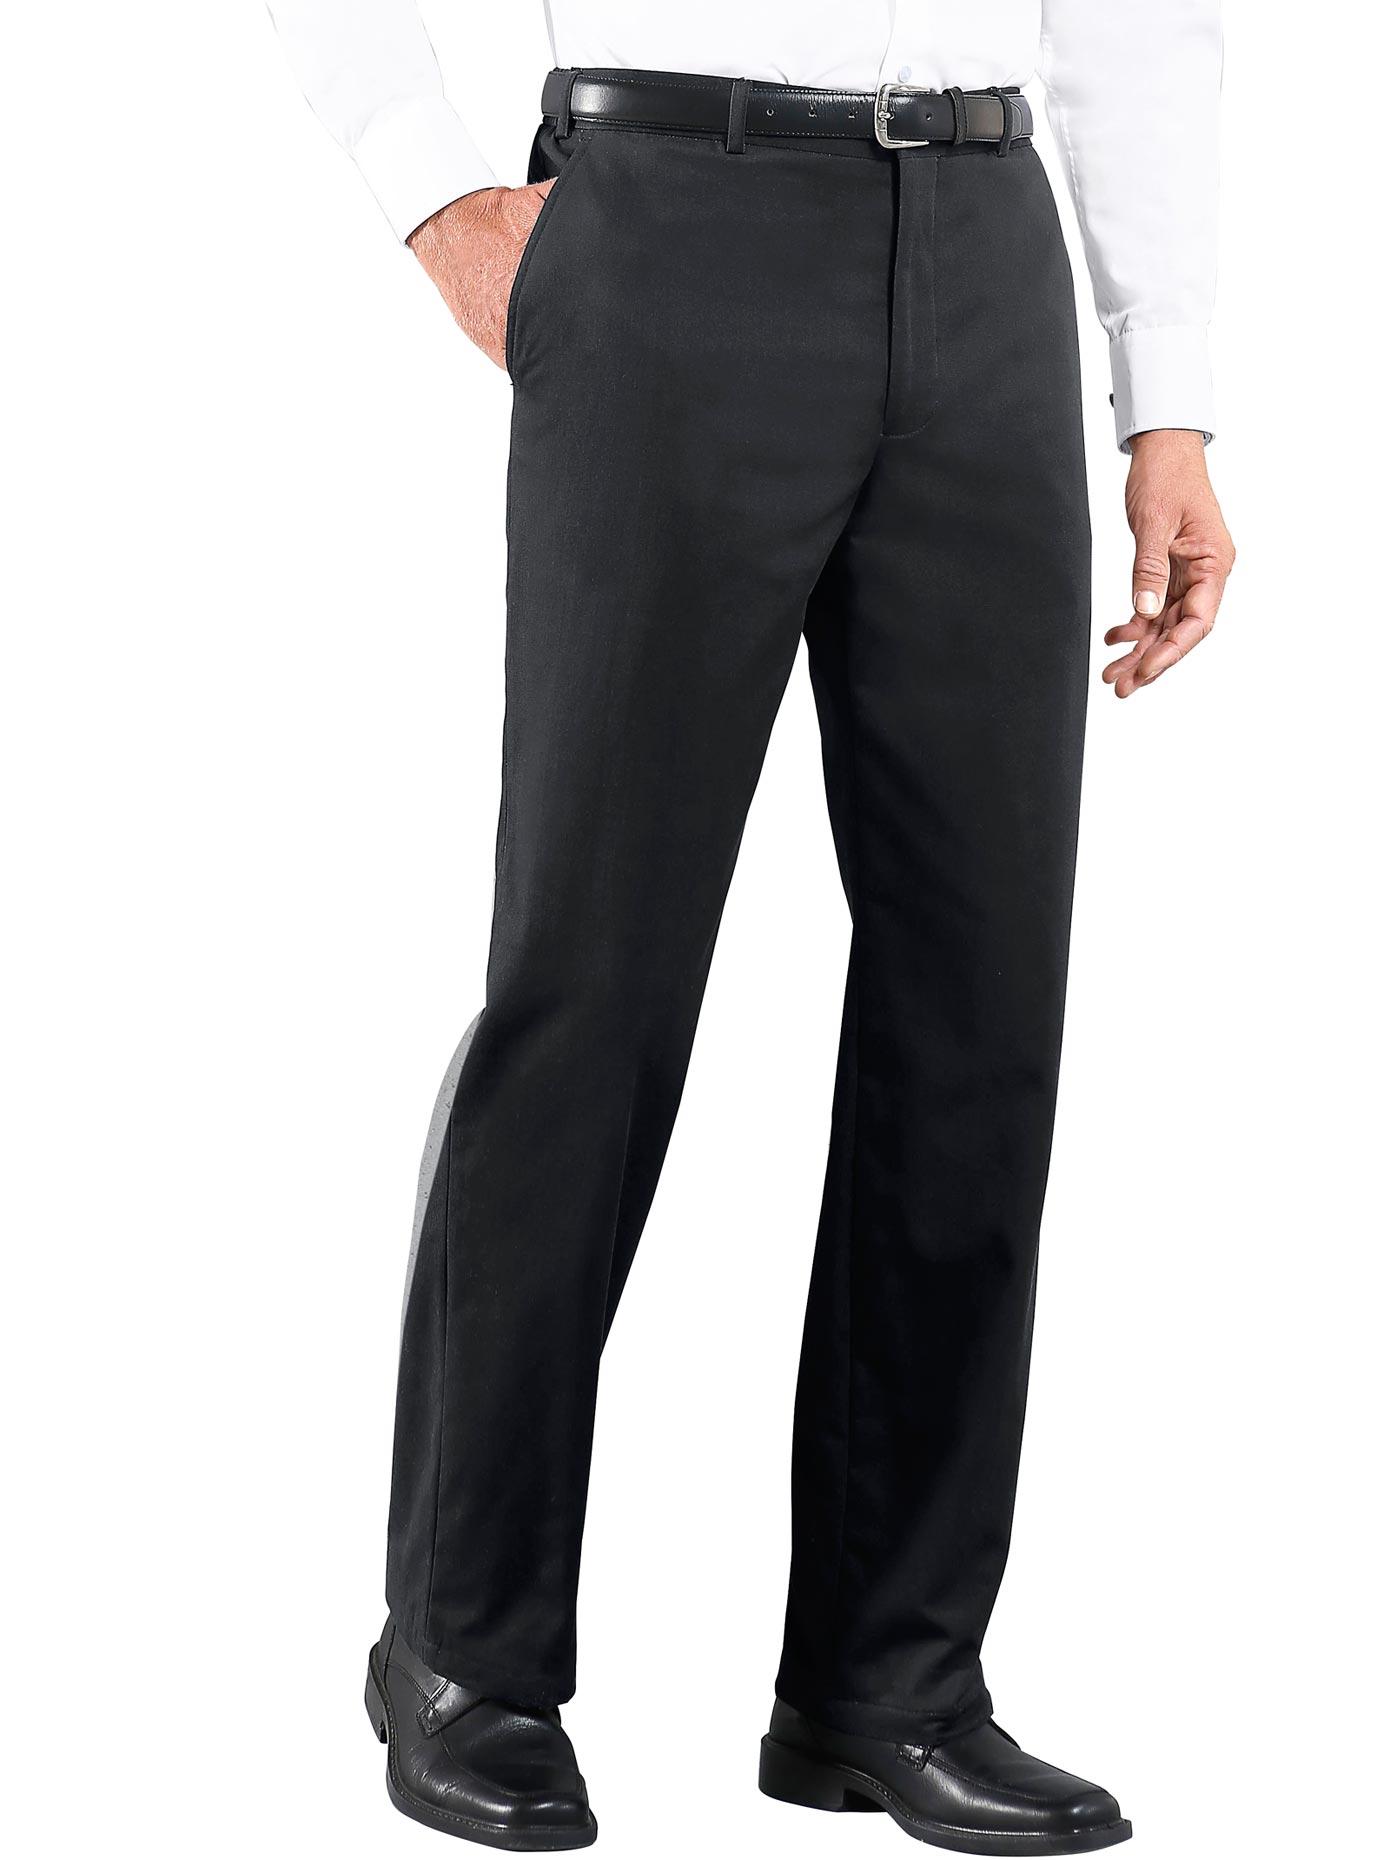 Classic Thermohose schwarz Herren Thermohosen Outdoorhosen Hosen Hosen, sonstige